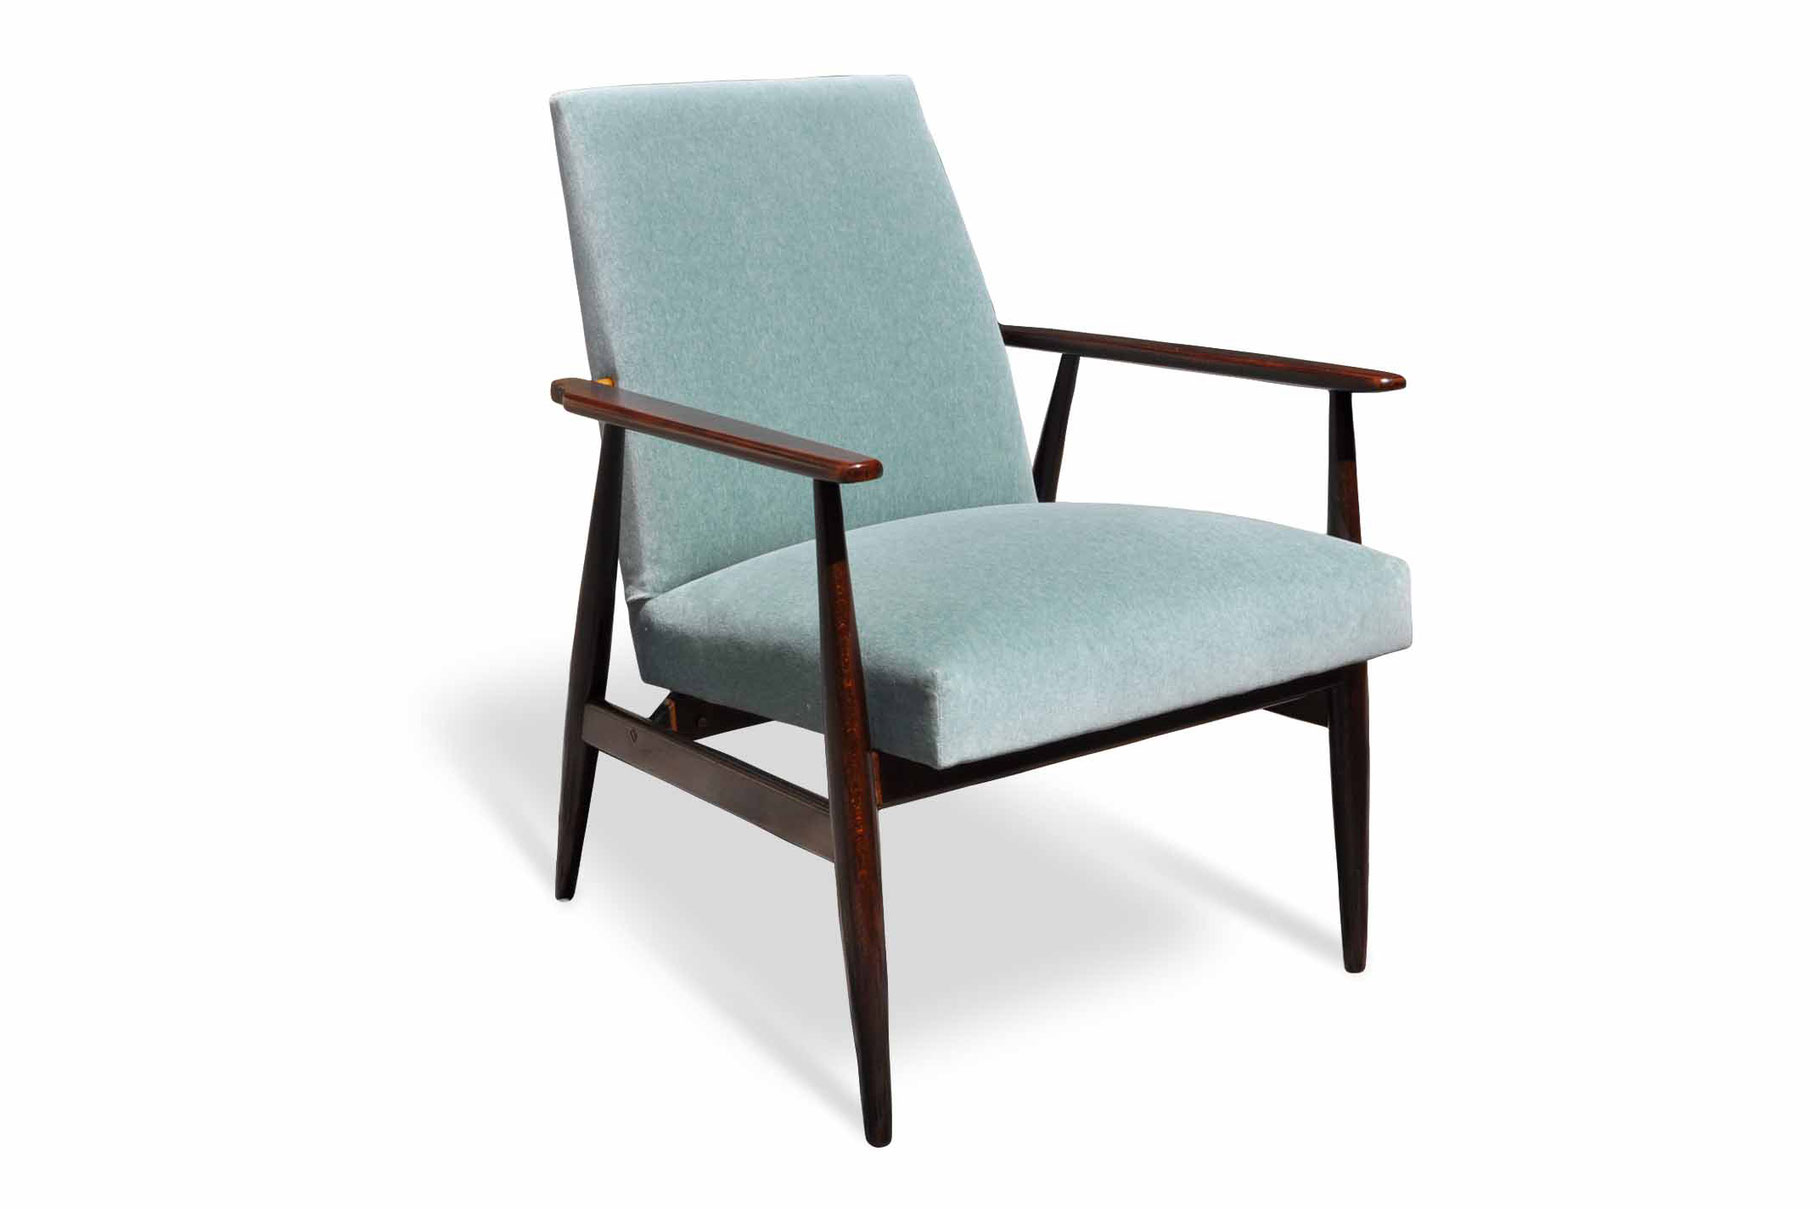 vintage designer chairs the aeron chair scandinavian retro mid century modern original